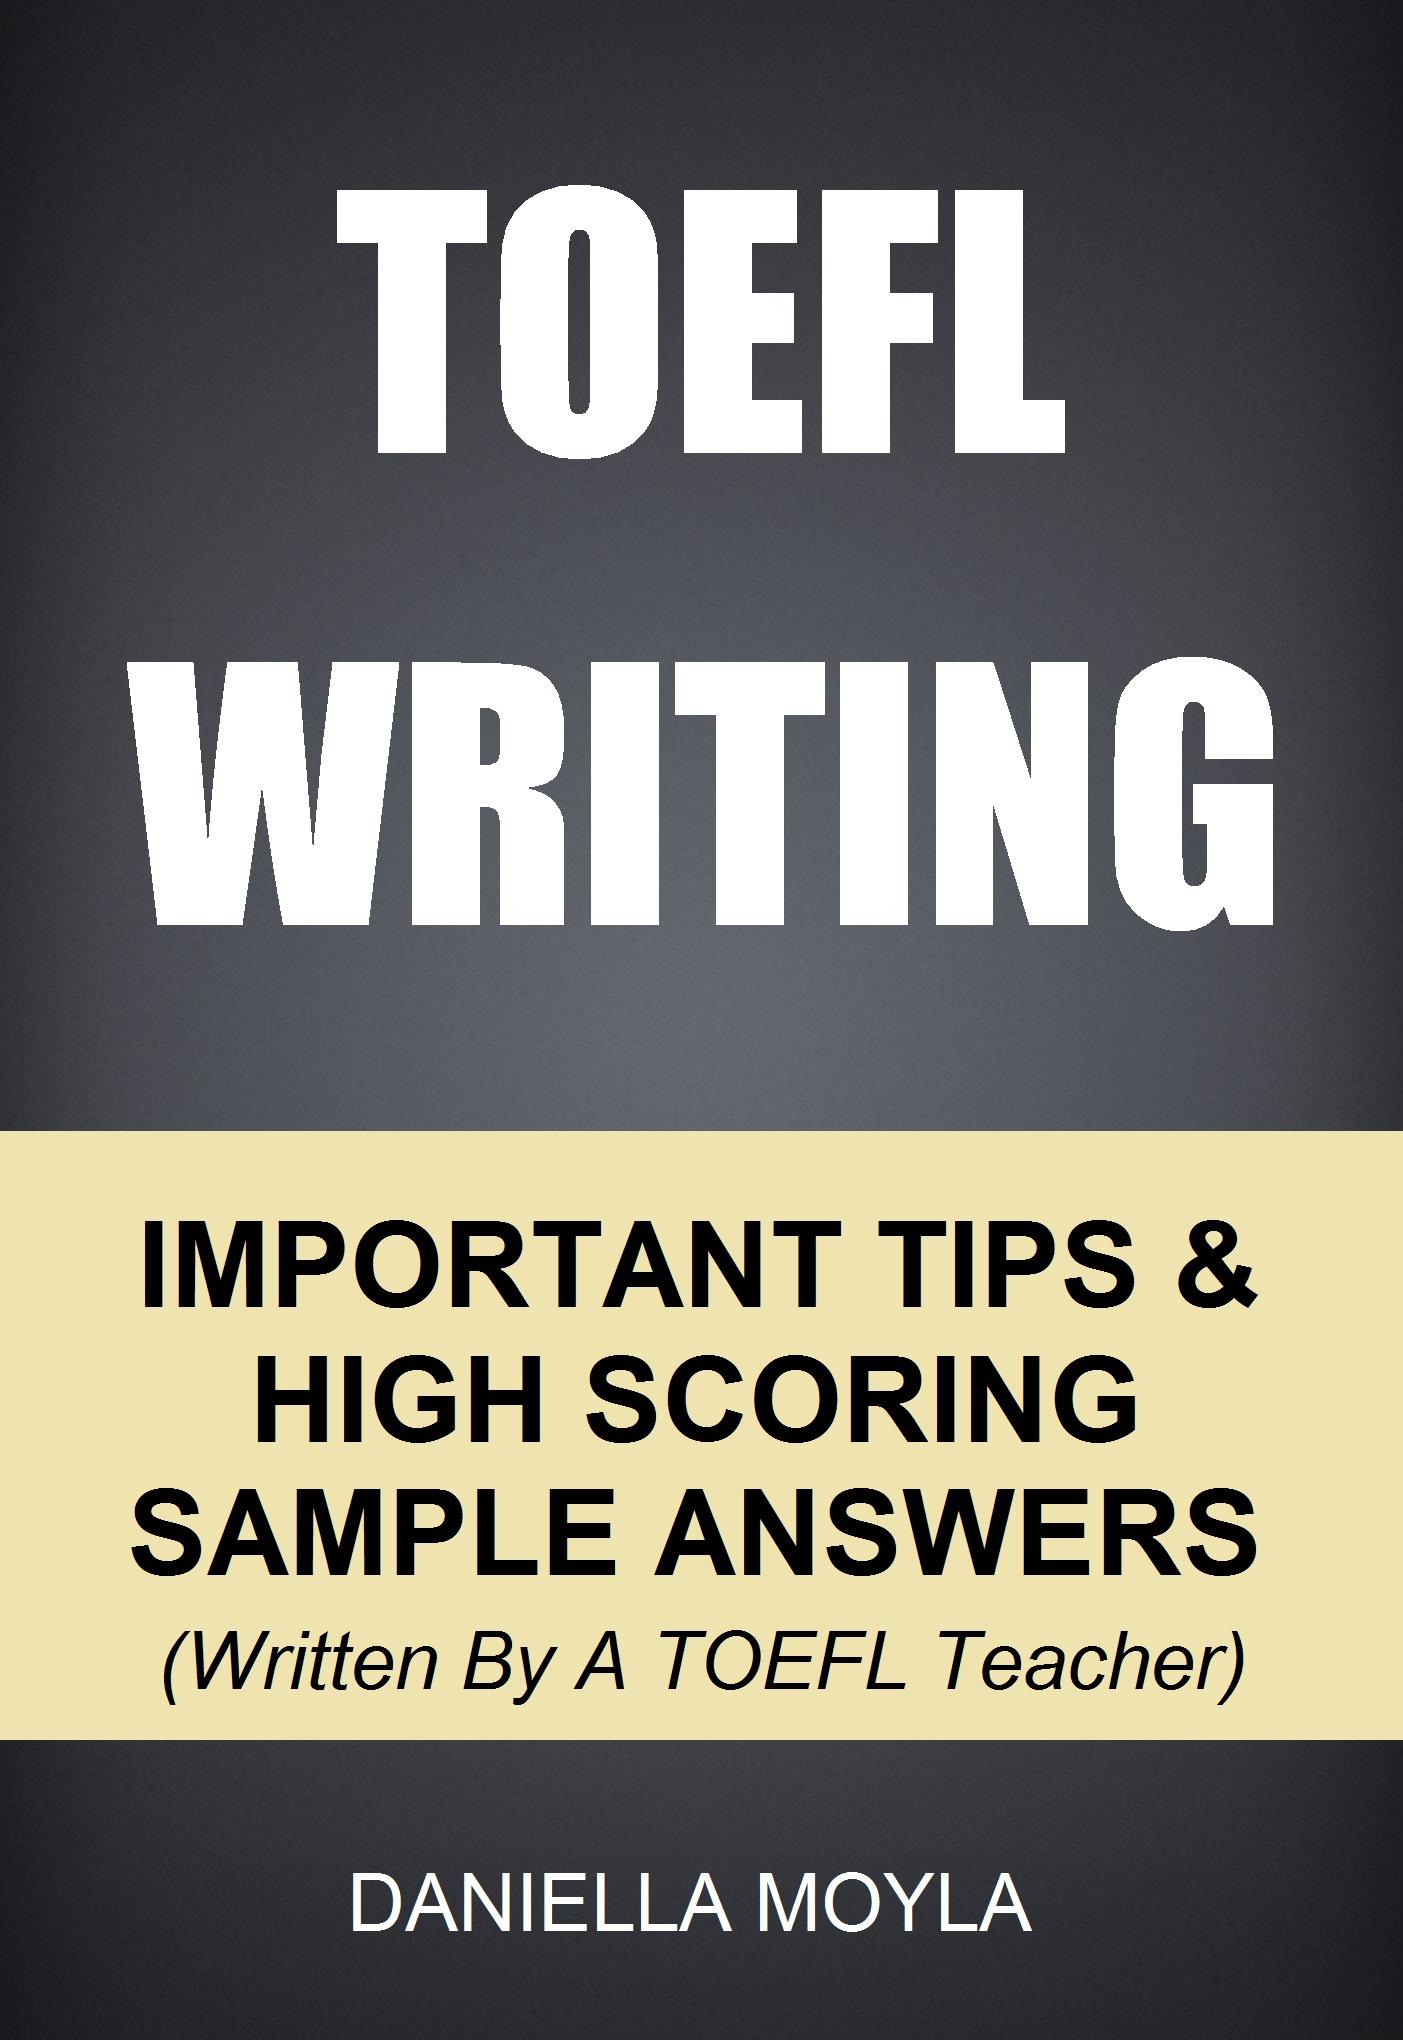 16 Ways to Improve your TOEFL Score